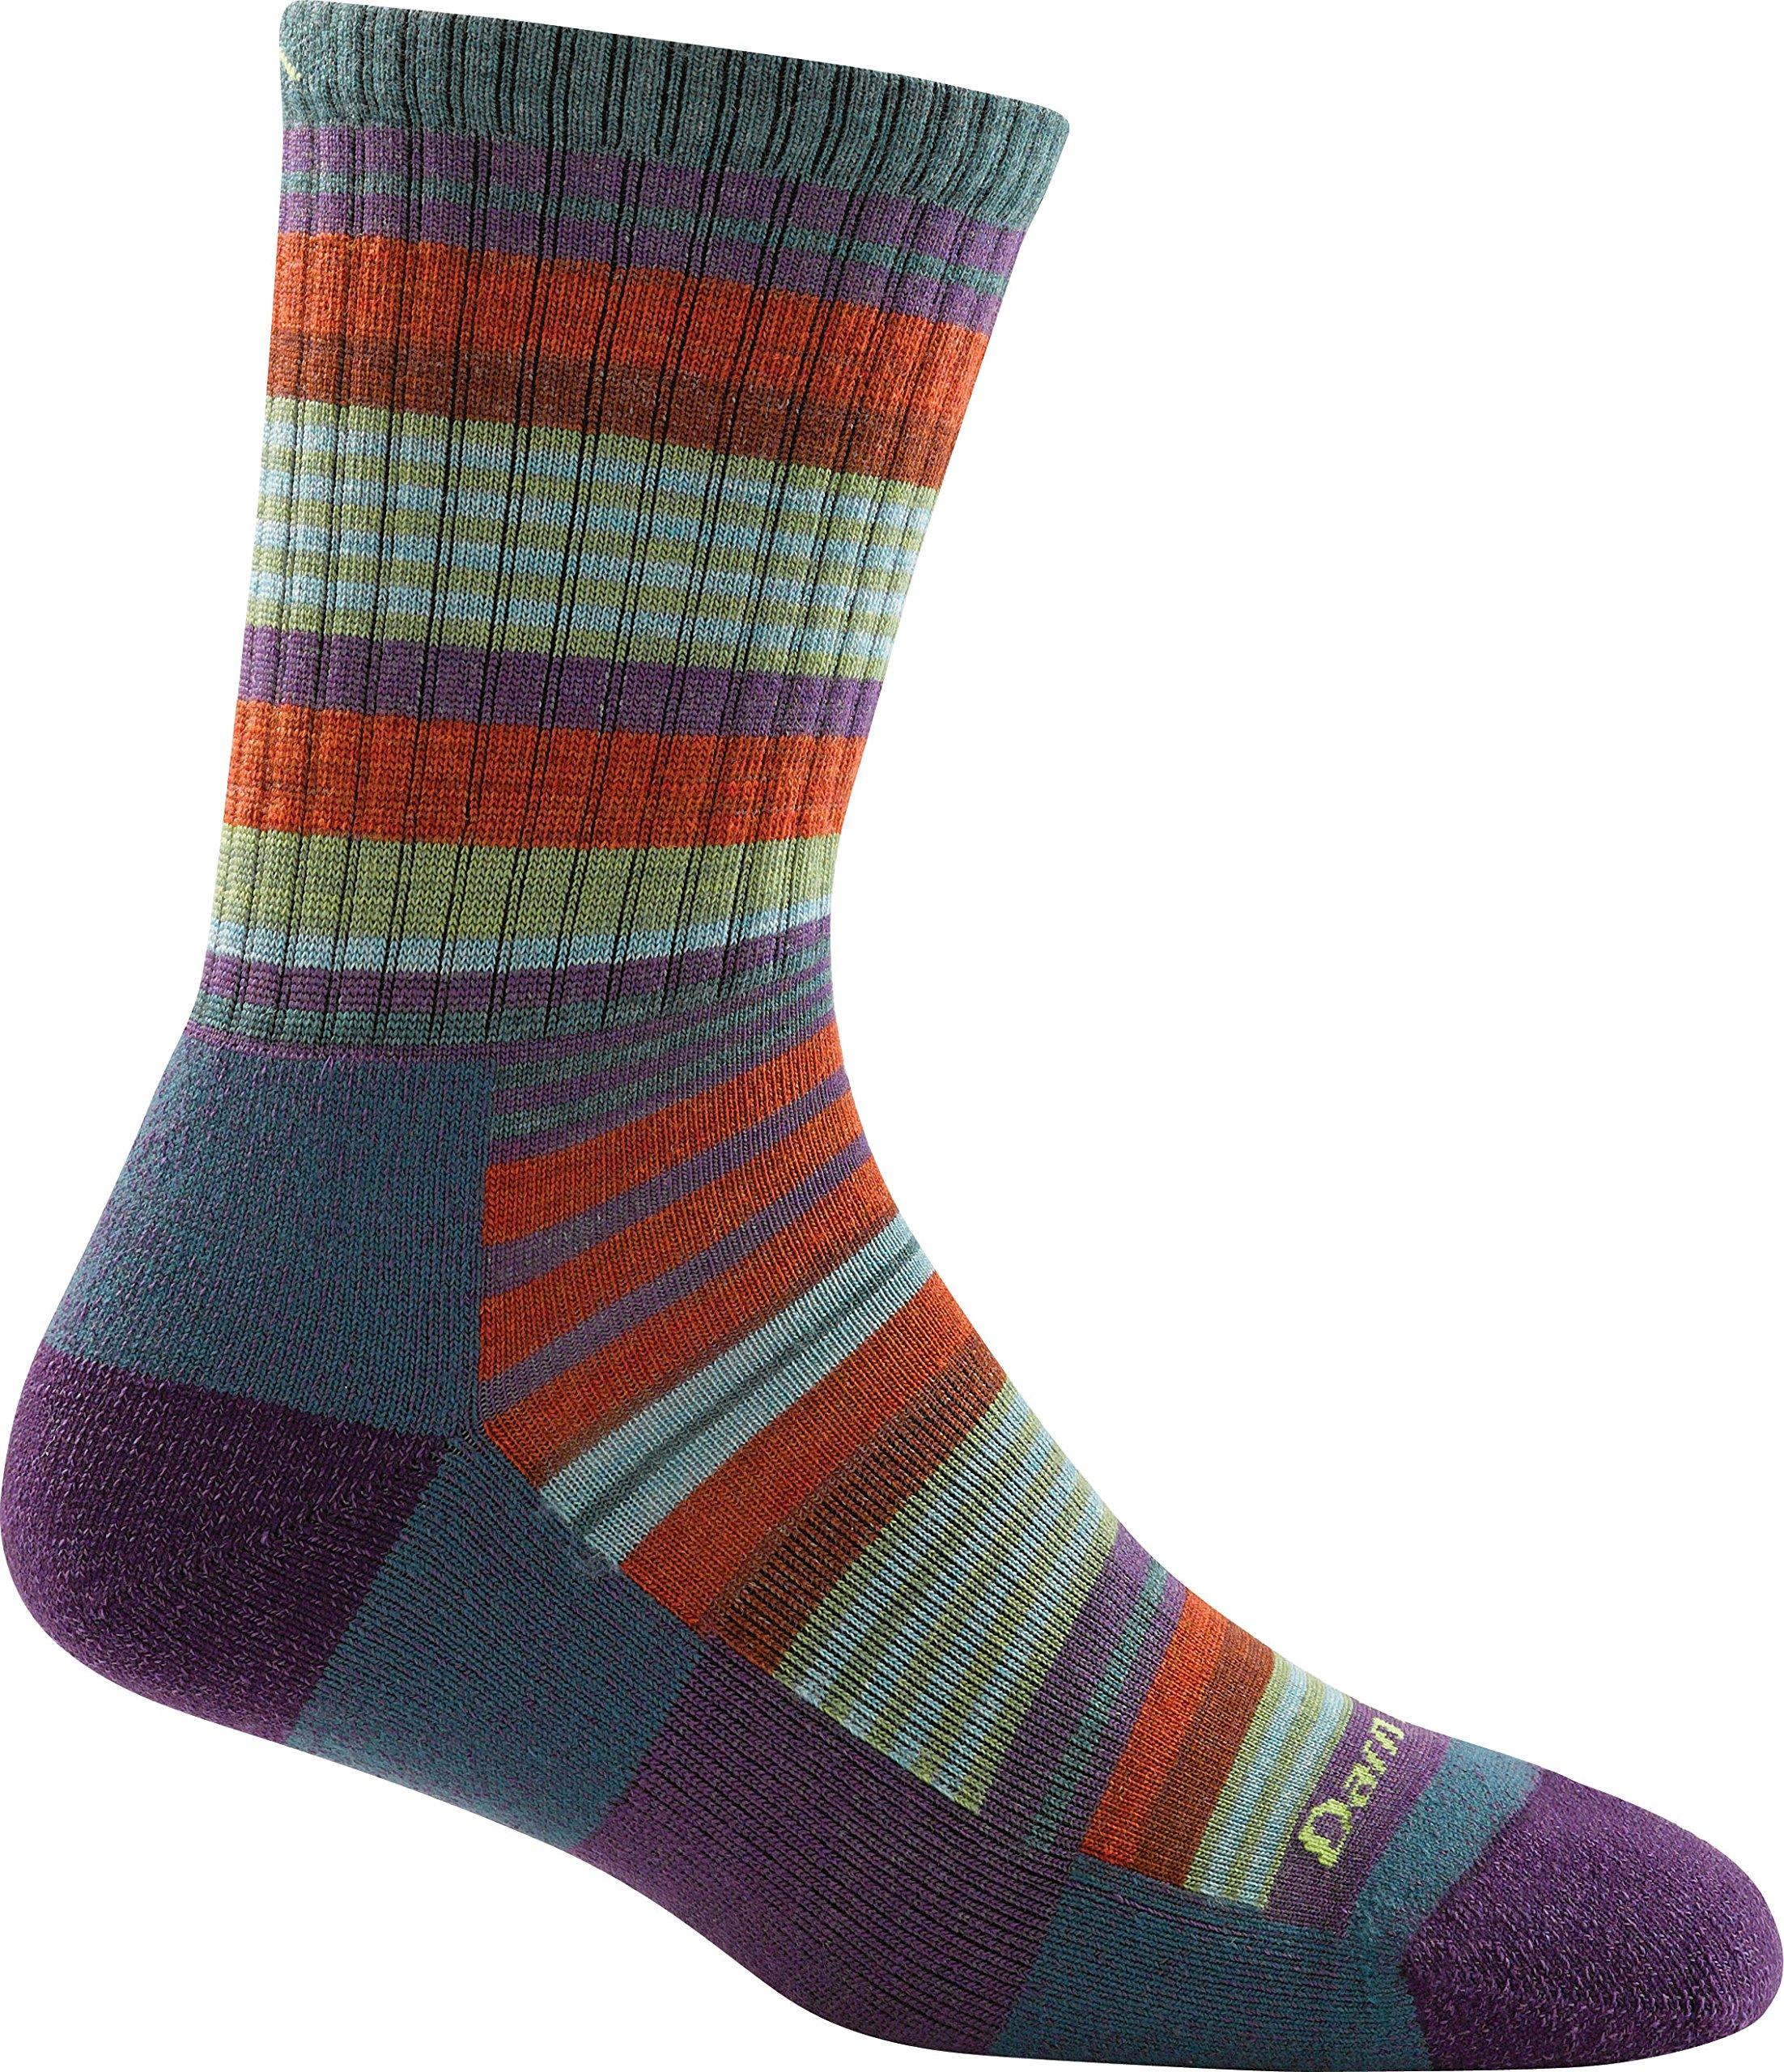 Darn Tough Sierra Stripe Micro Crew Light Cushion Sock - Kid's Teal Medium